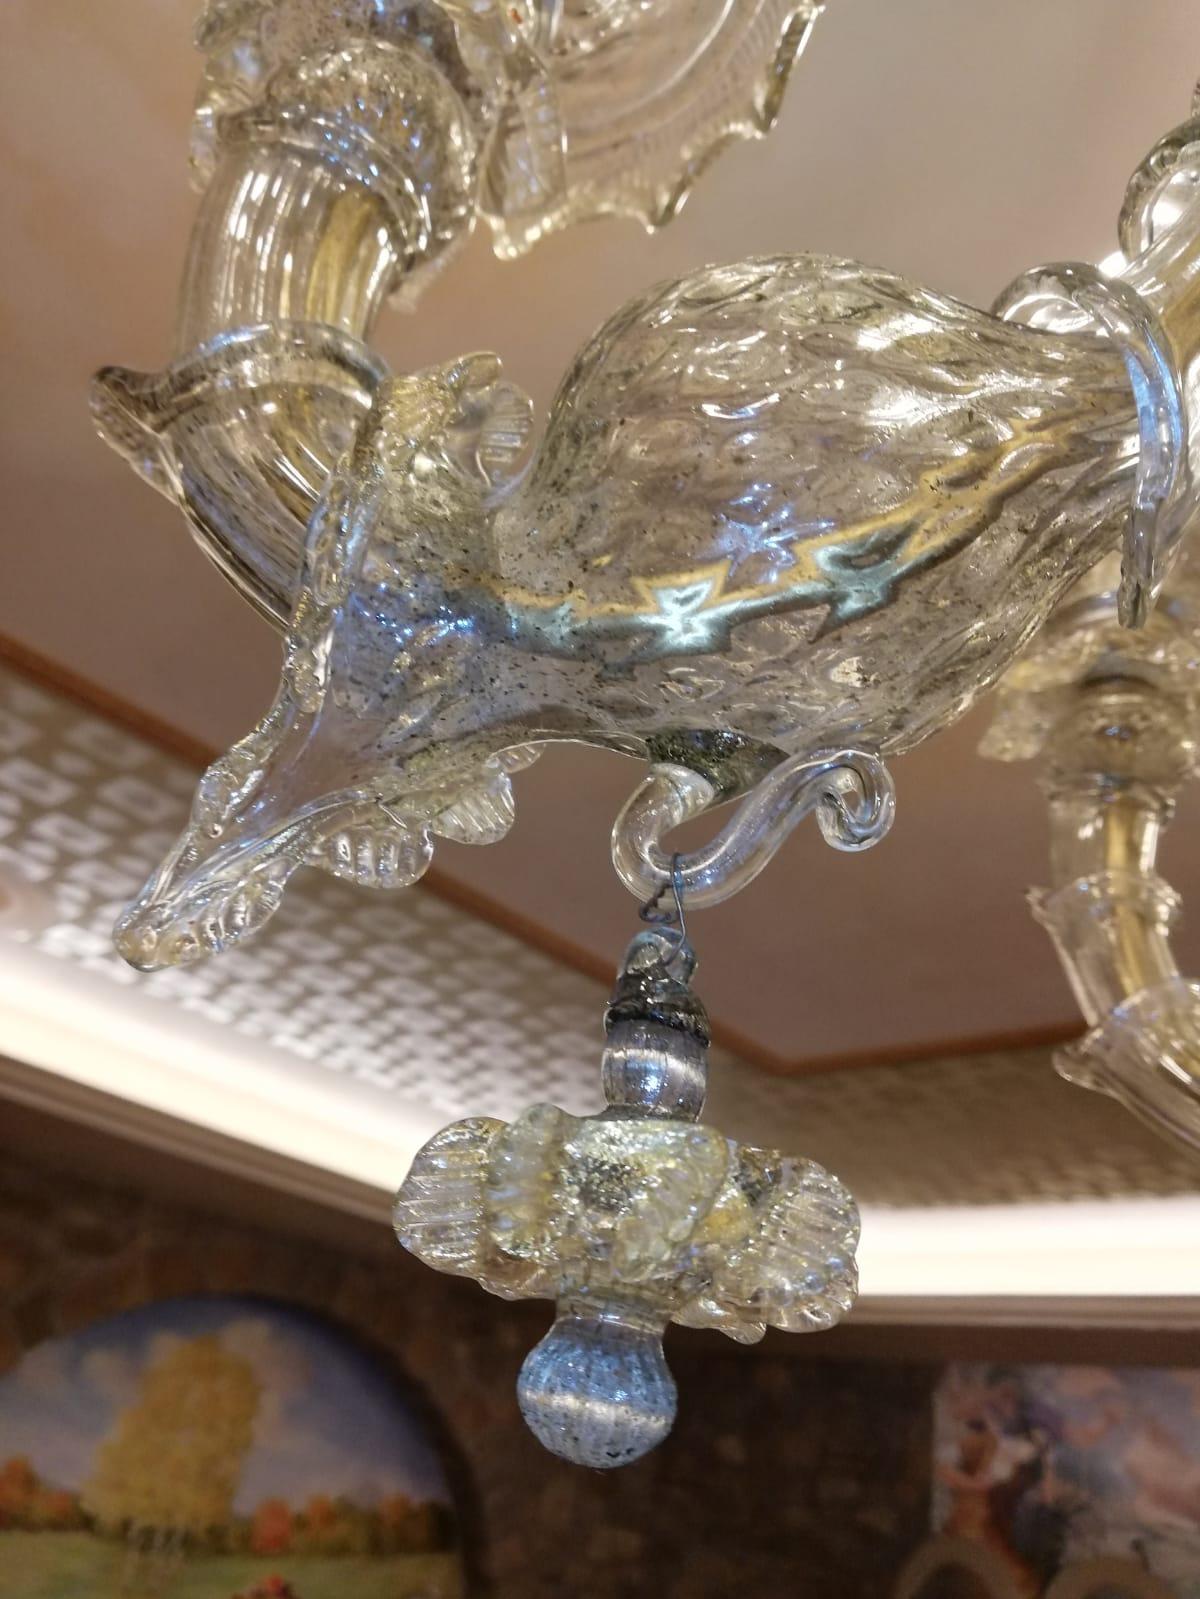 5 ricambi lampadario vetro murano 5 foglie varie misure. Ricambi Per Lampadari In Vetro Di Murano E Specchi Veneziani Carezzonico